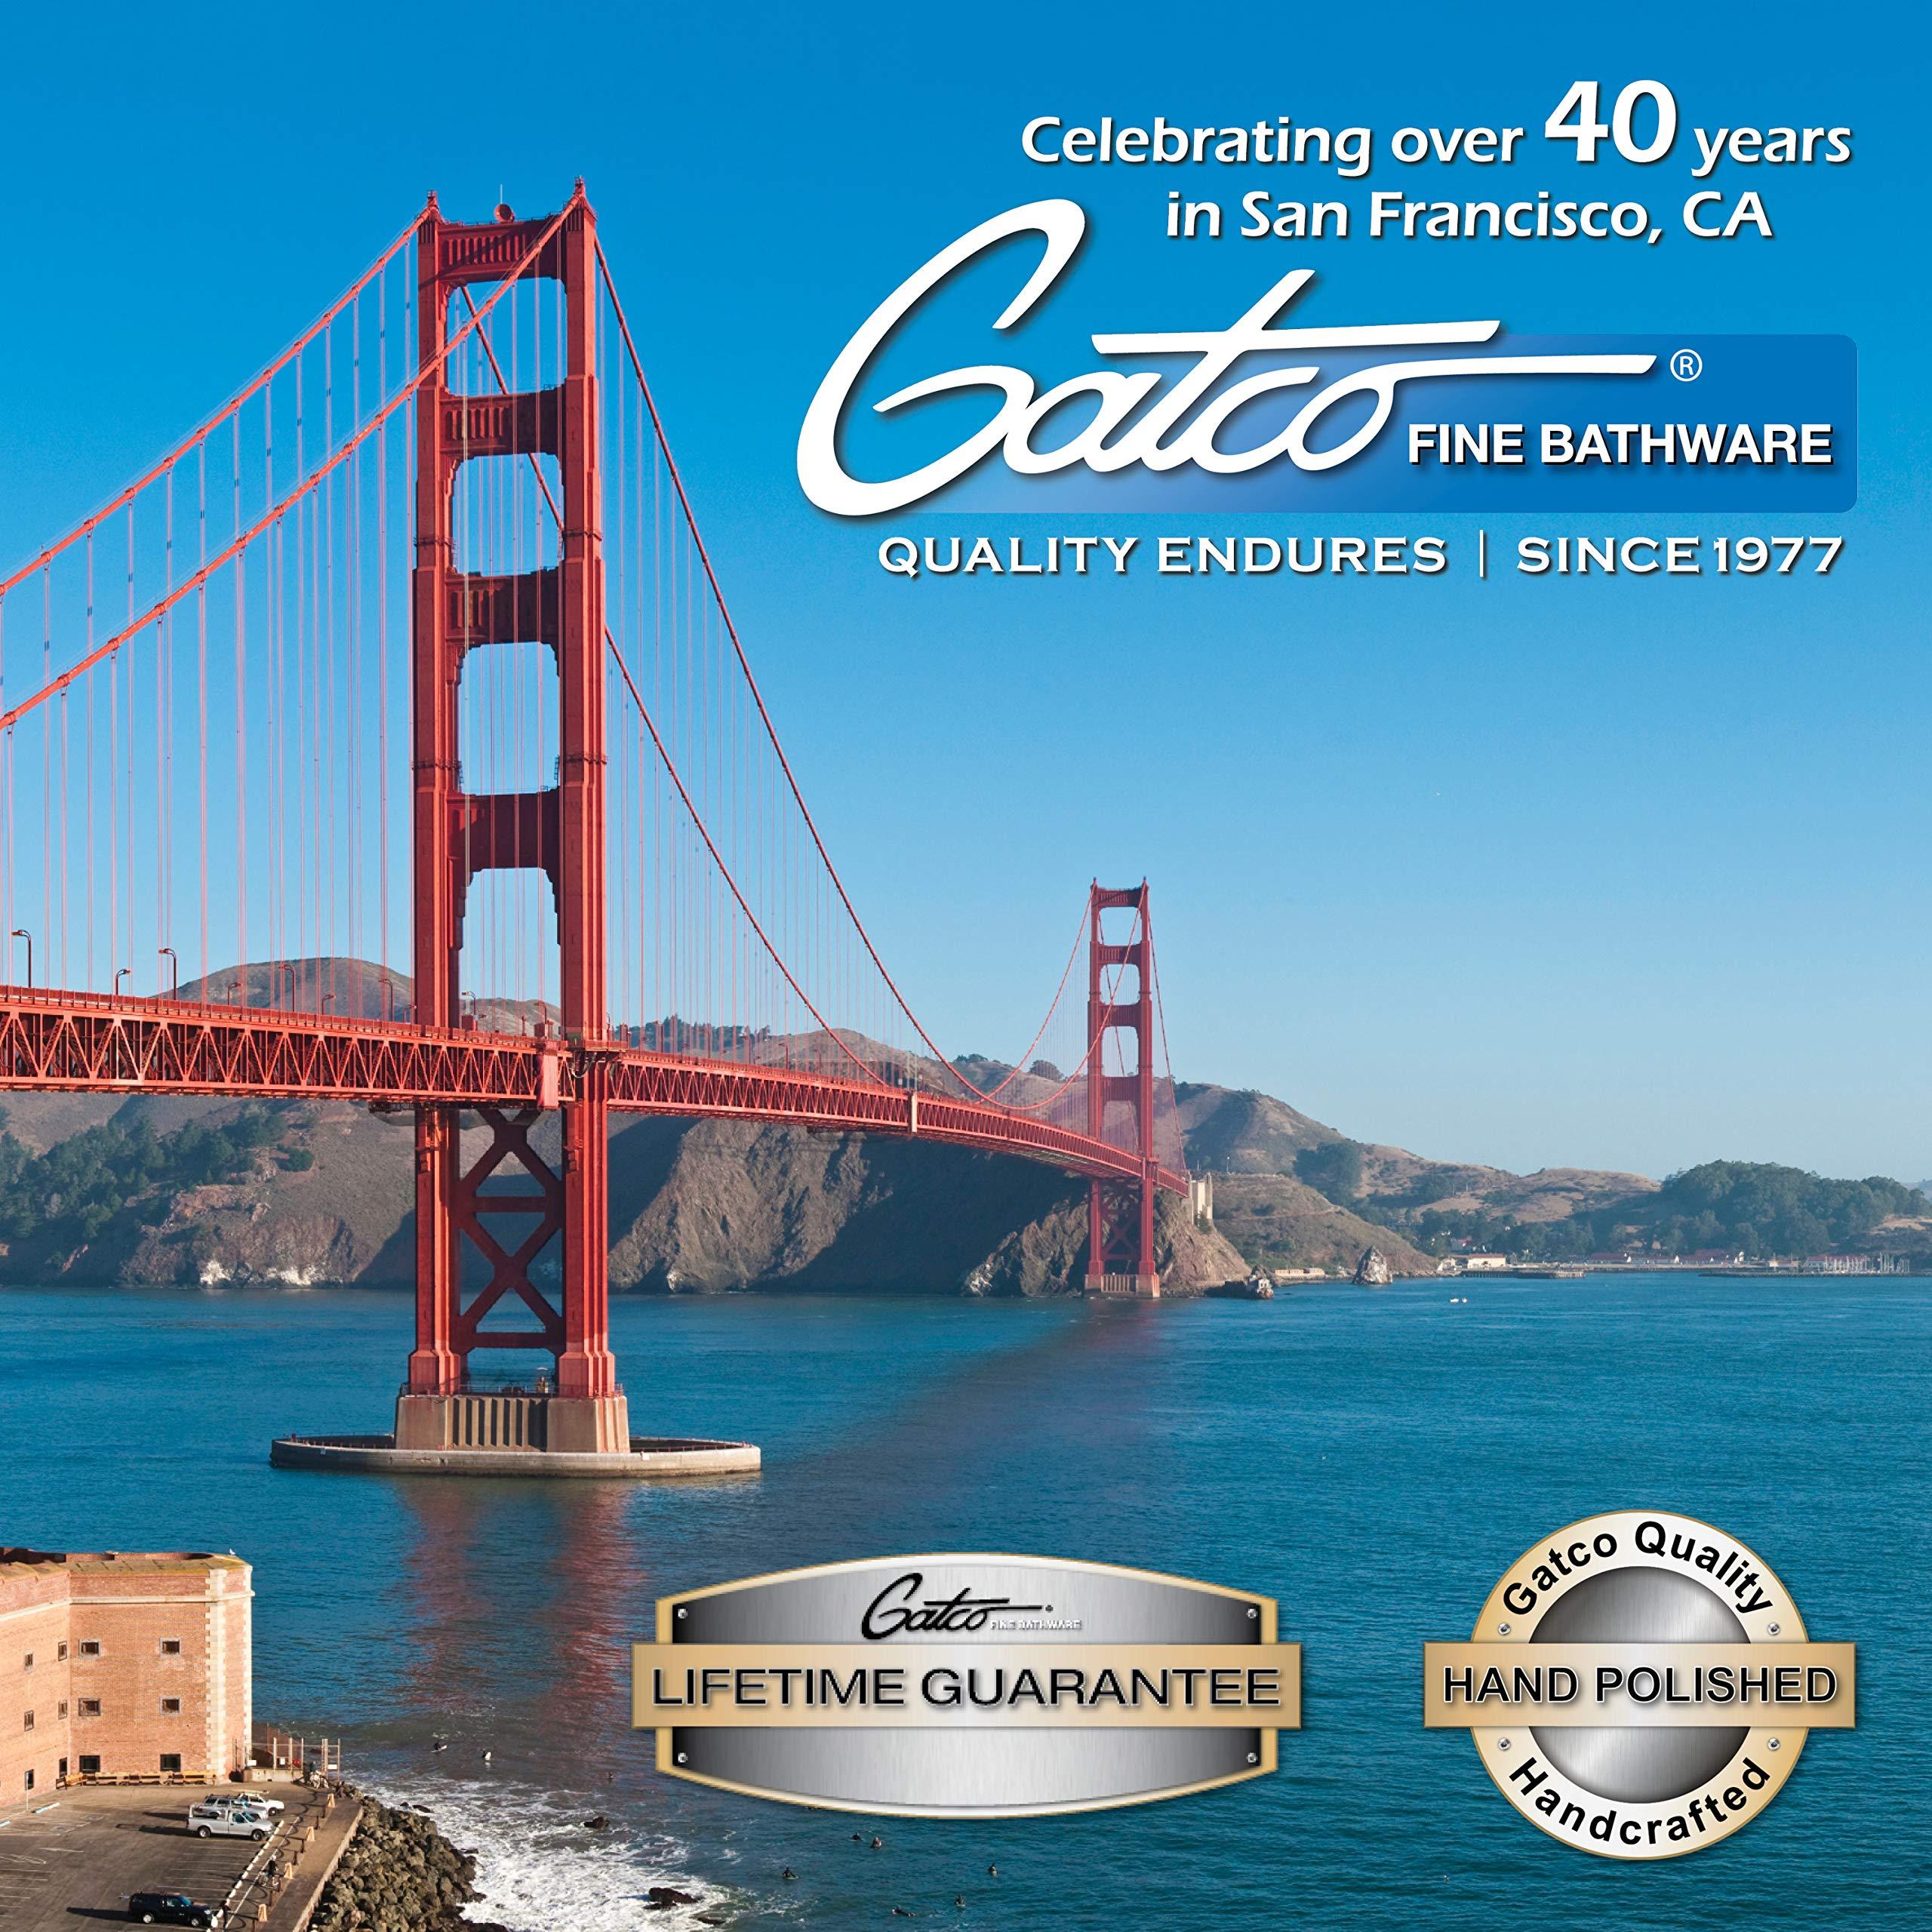 Gatco 1436 Pedestal Toilet Paper Holder, Polished Brass by Gatco (Image #4)